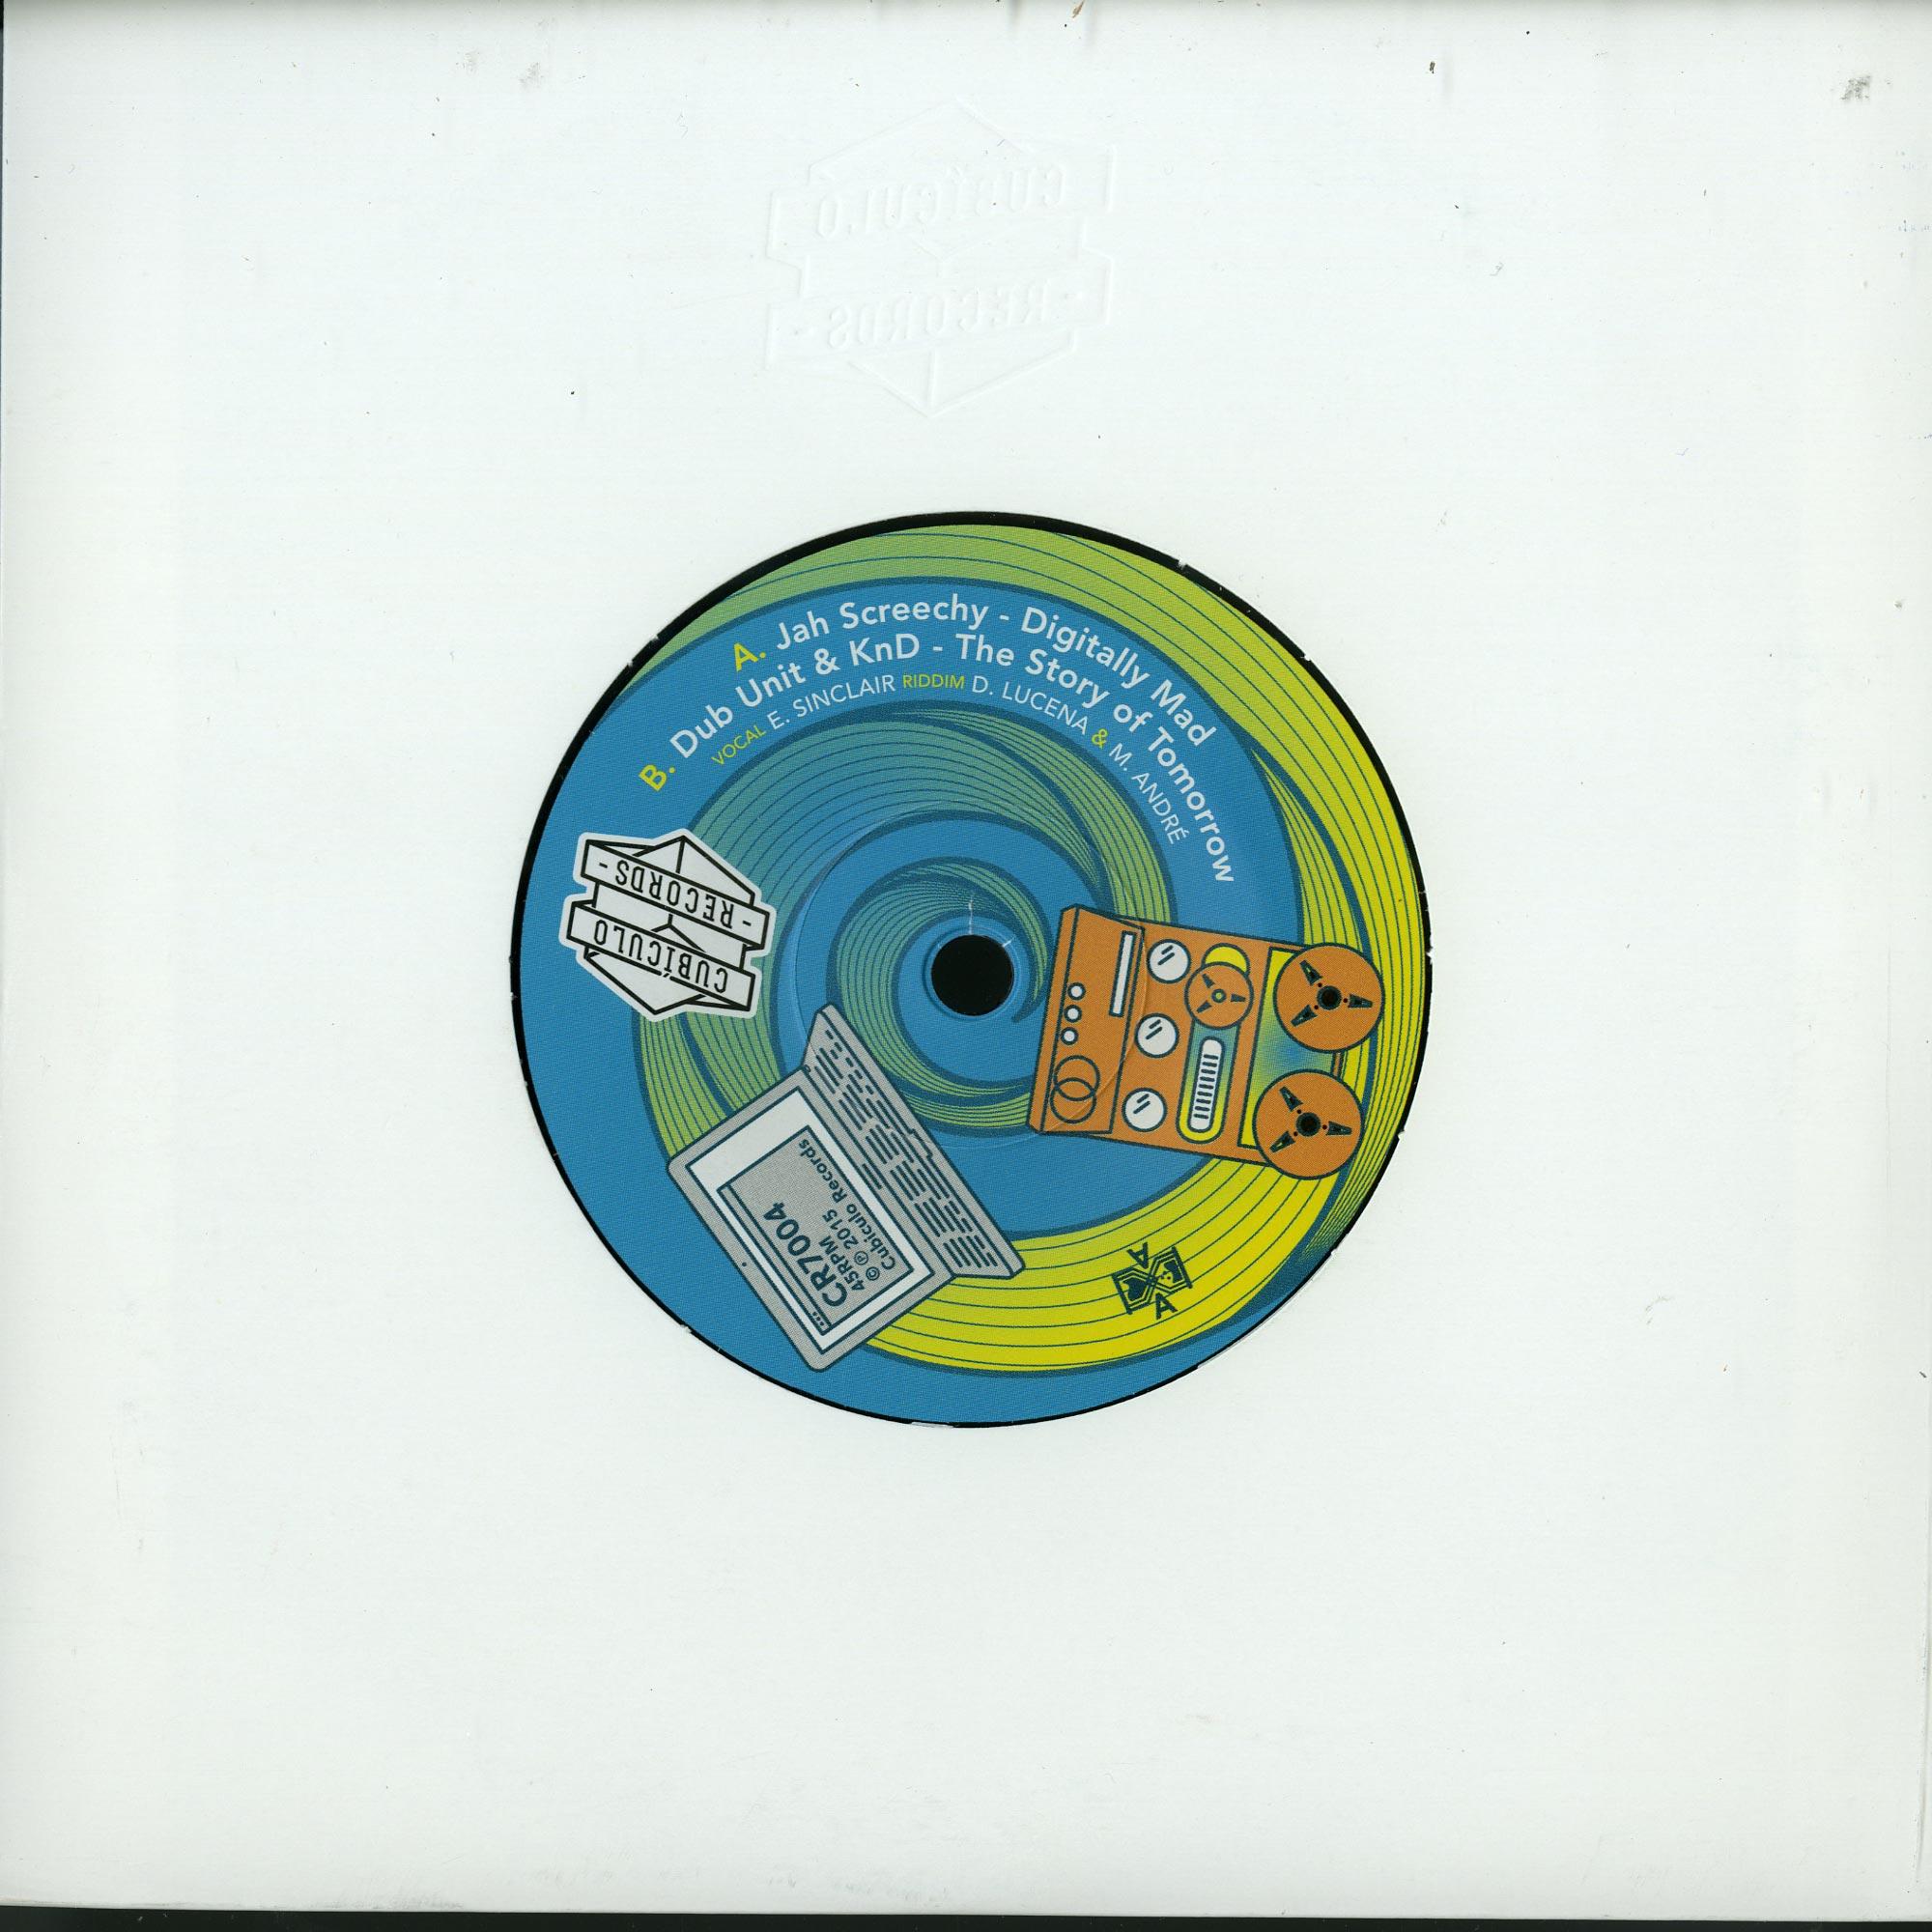 Jah Screechy / Dub Unit & KnD - DIGITALLY MAD / THE STORY OF TOMORROW